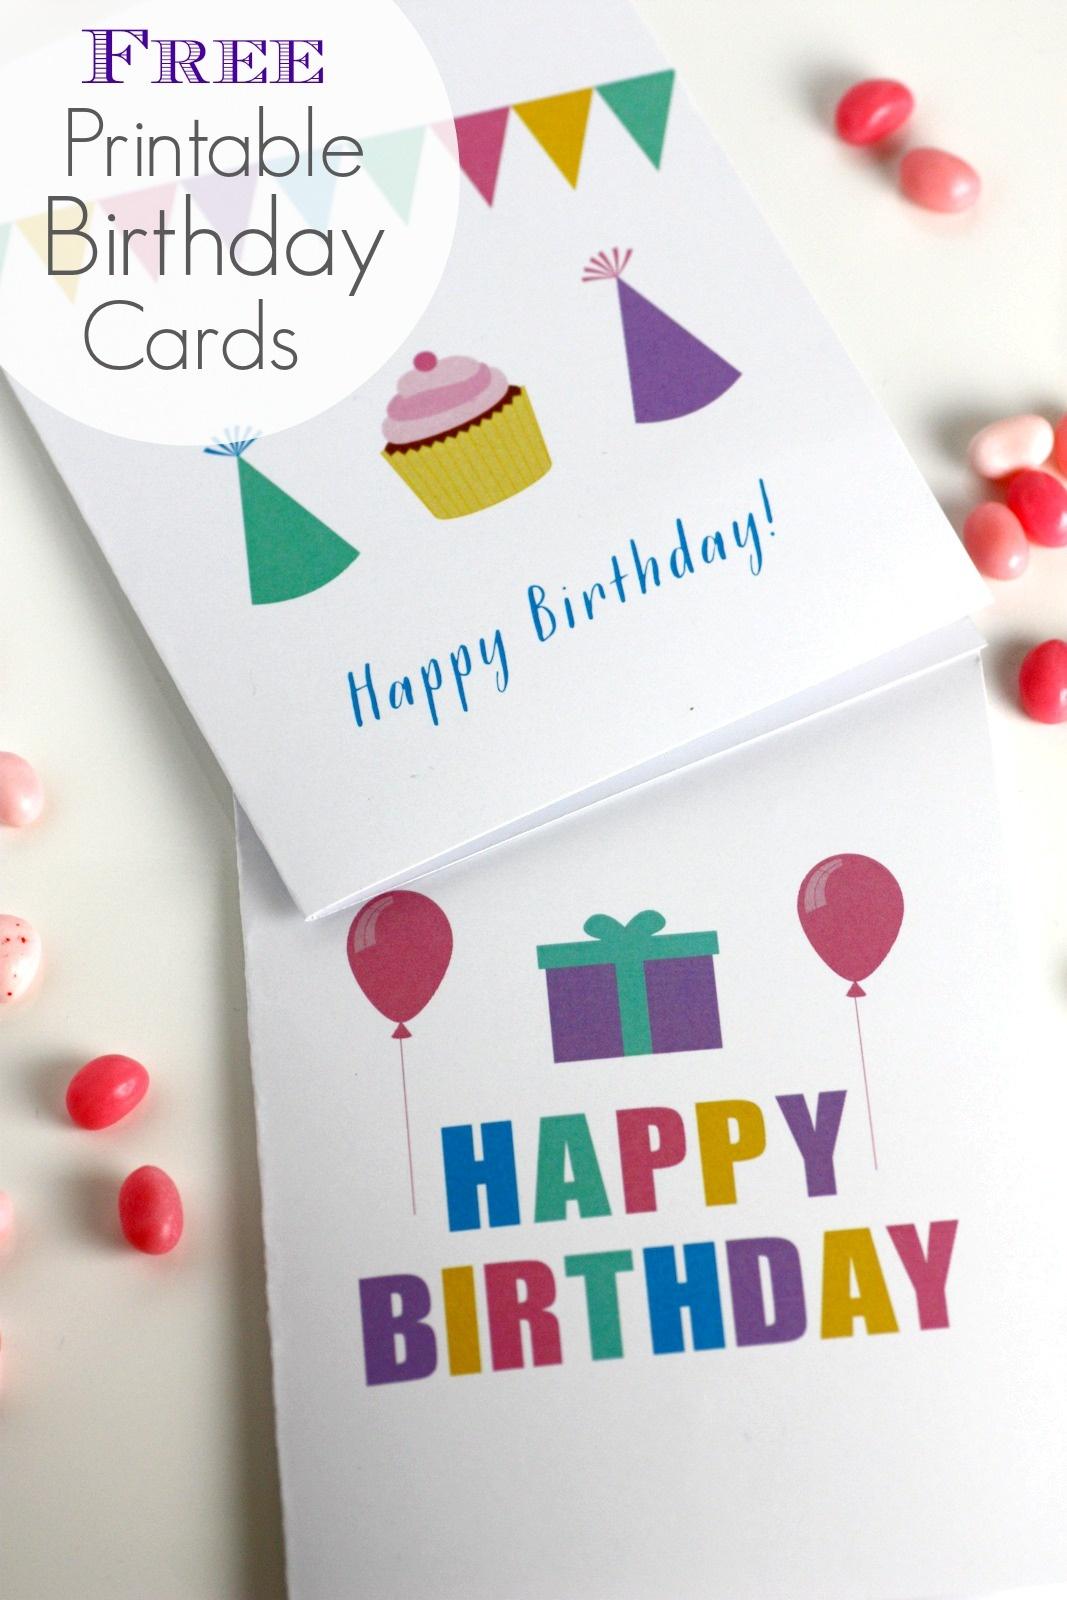 Free Printable Blank Birthday Cards | Catch My Party - Free Printable Happy Birthday Cards